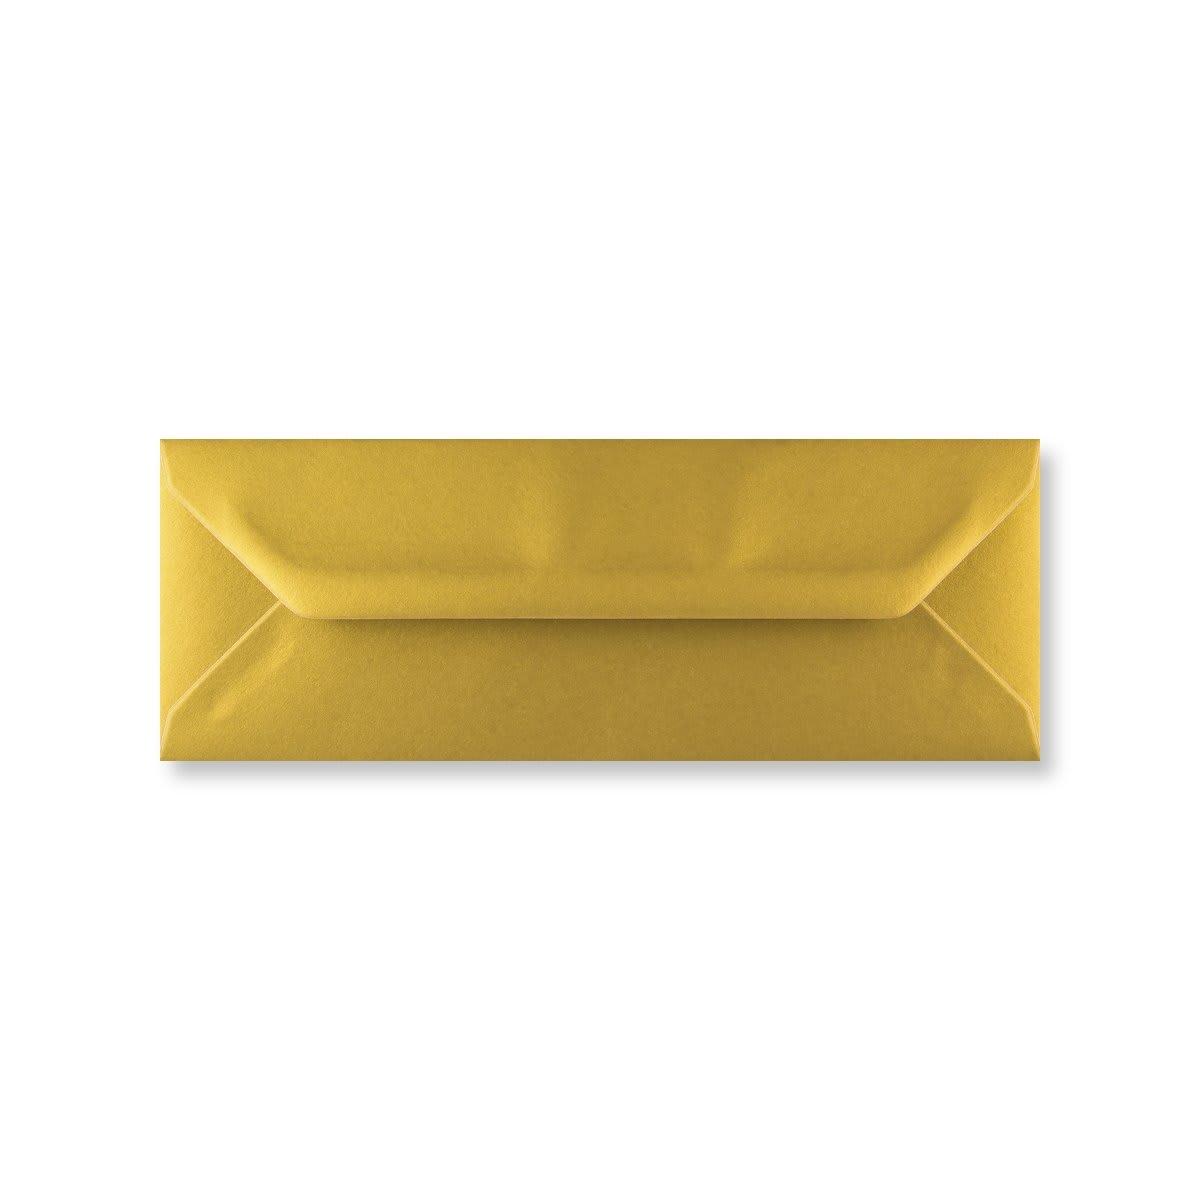 METALLIC GOLD 80 x 215 mm ENVELOPES (i3)